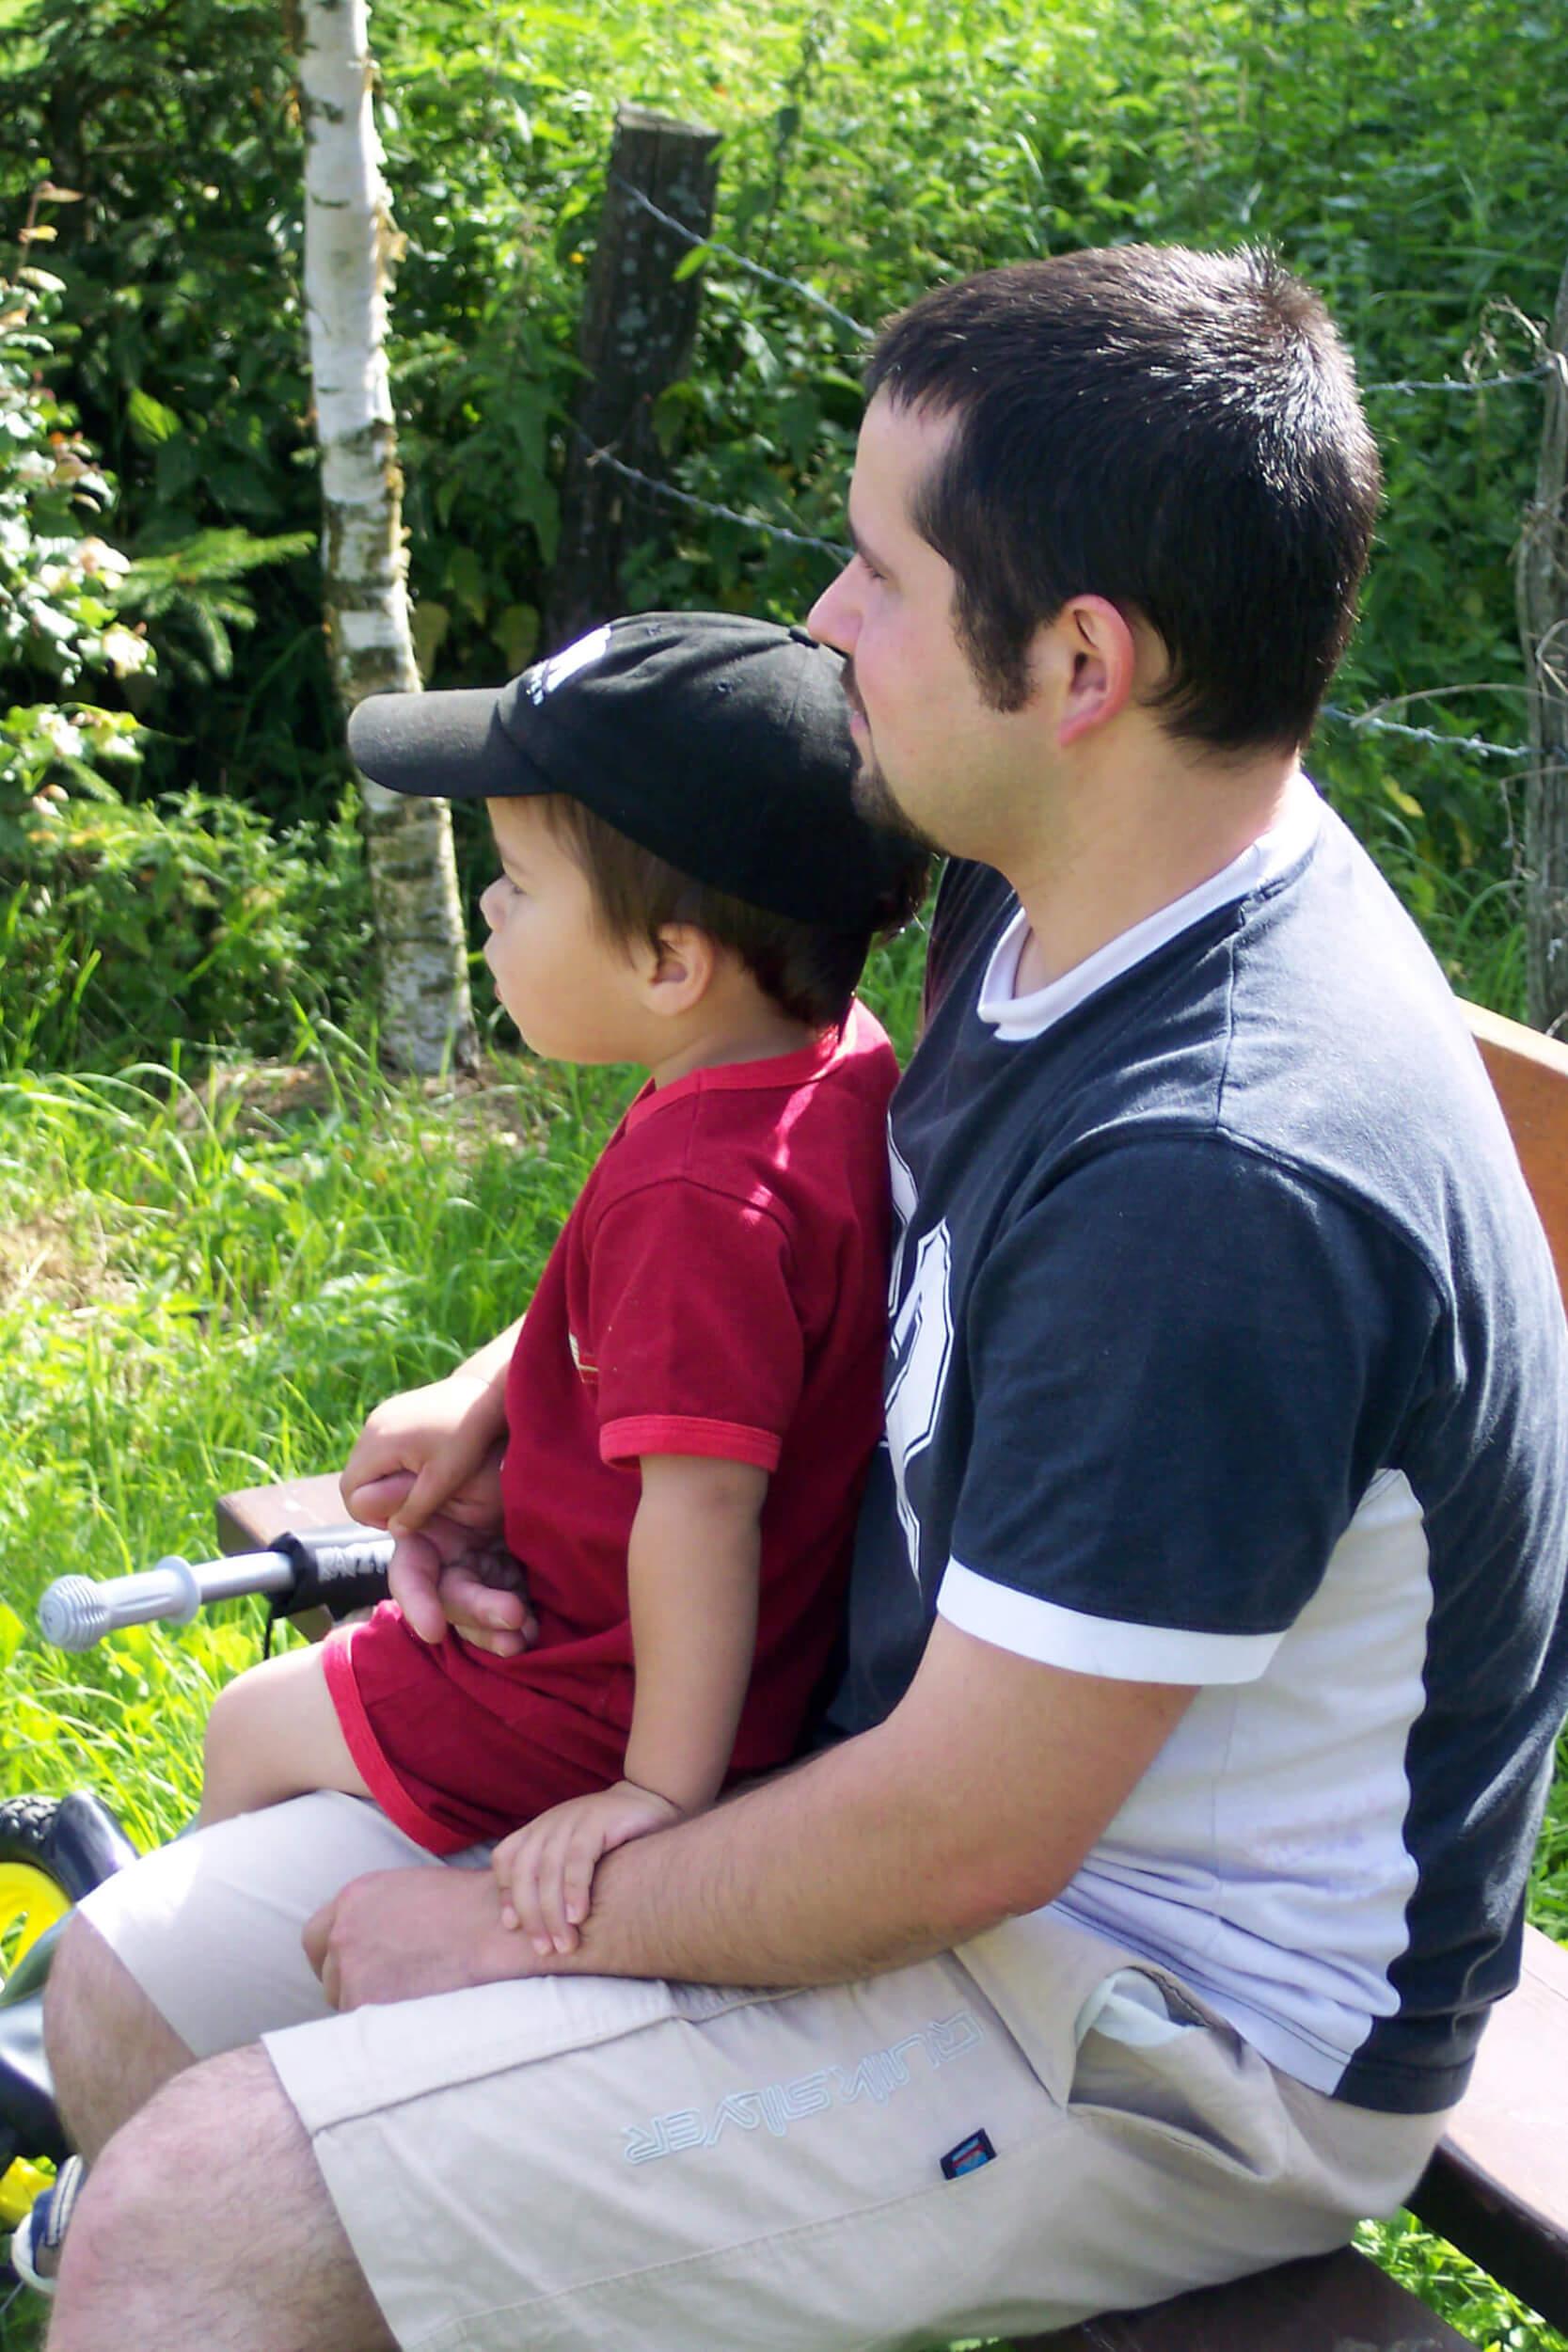 Kind | Vater mit Sohn (c) Maryline Weynand / pixelio.de